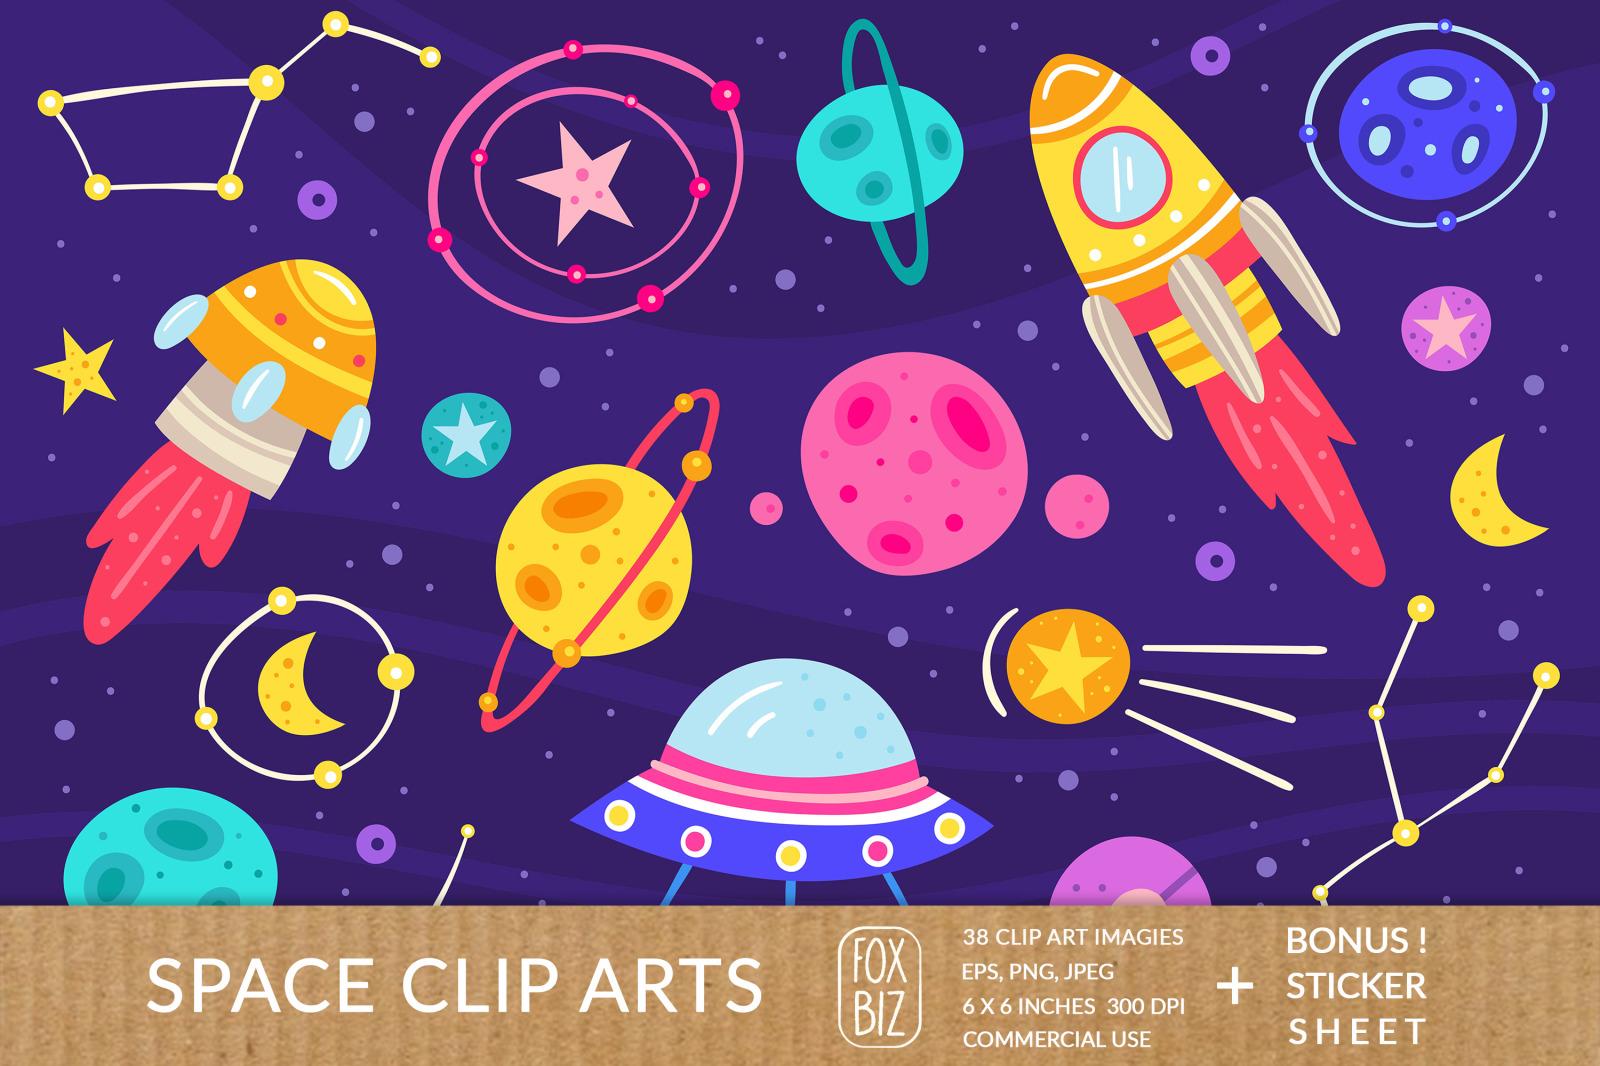 Space clipart. Digital prints, stickers. Vector, flat set.